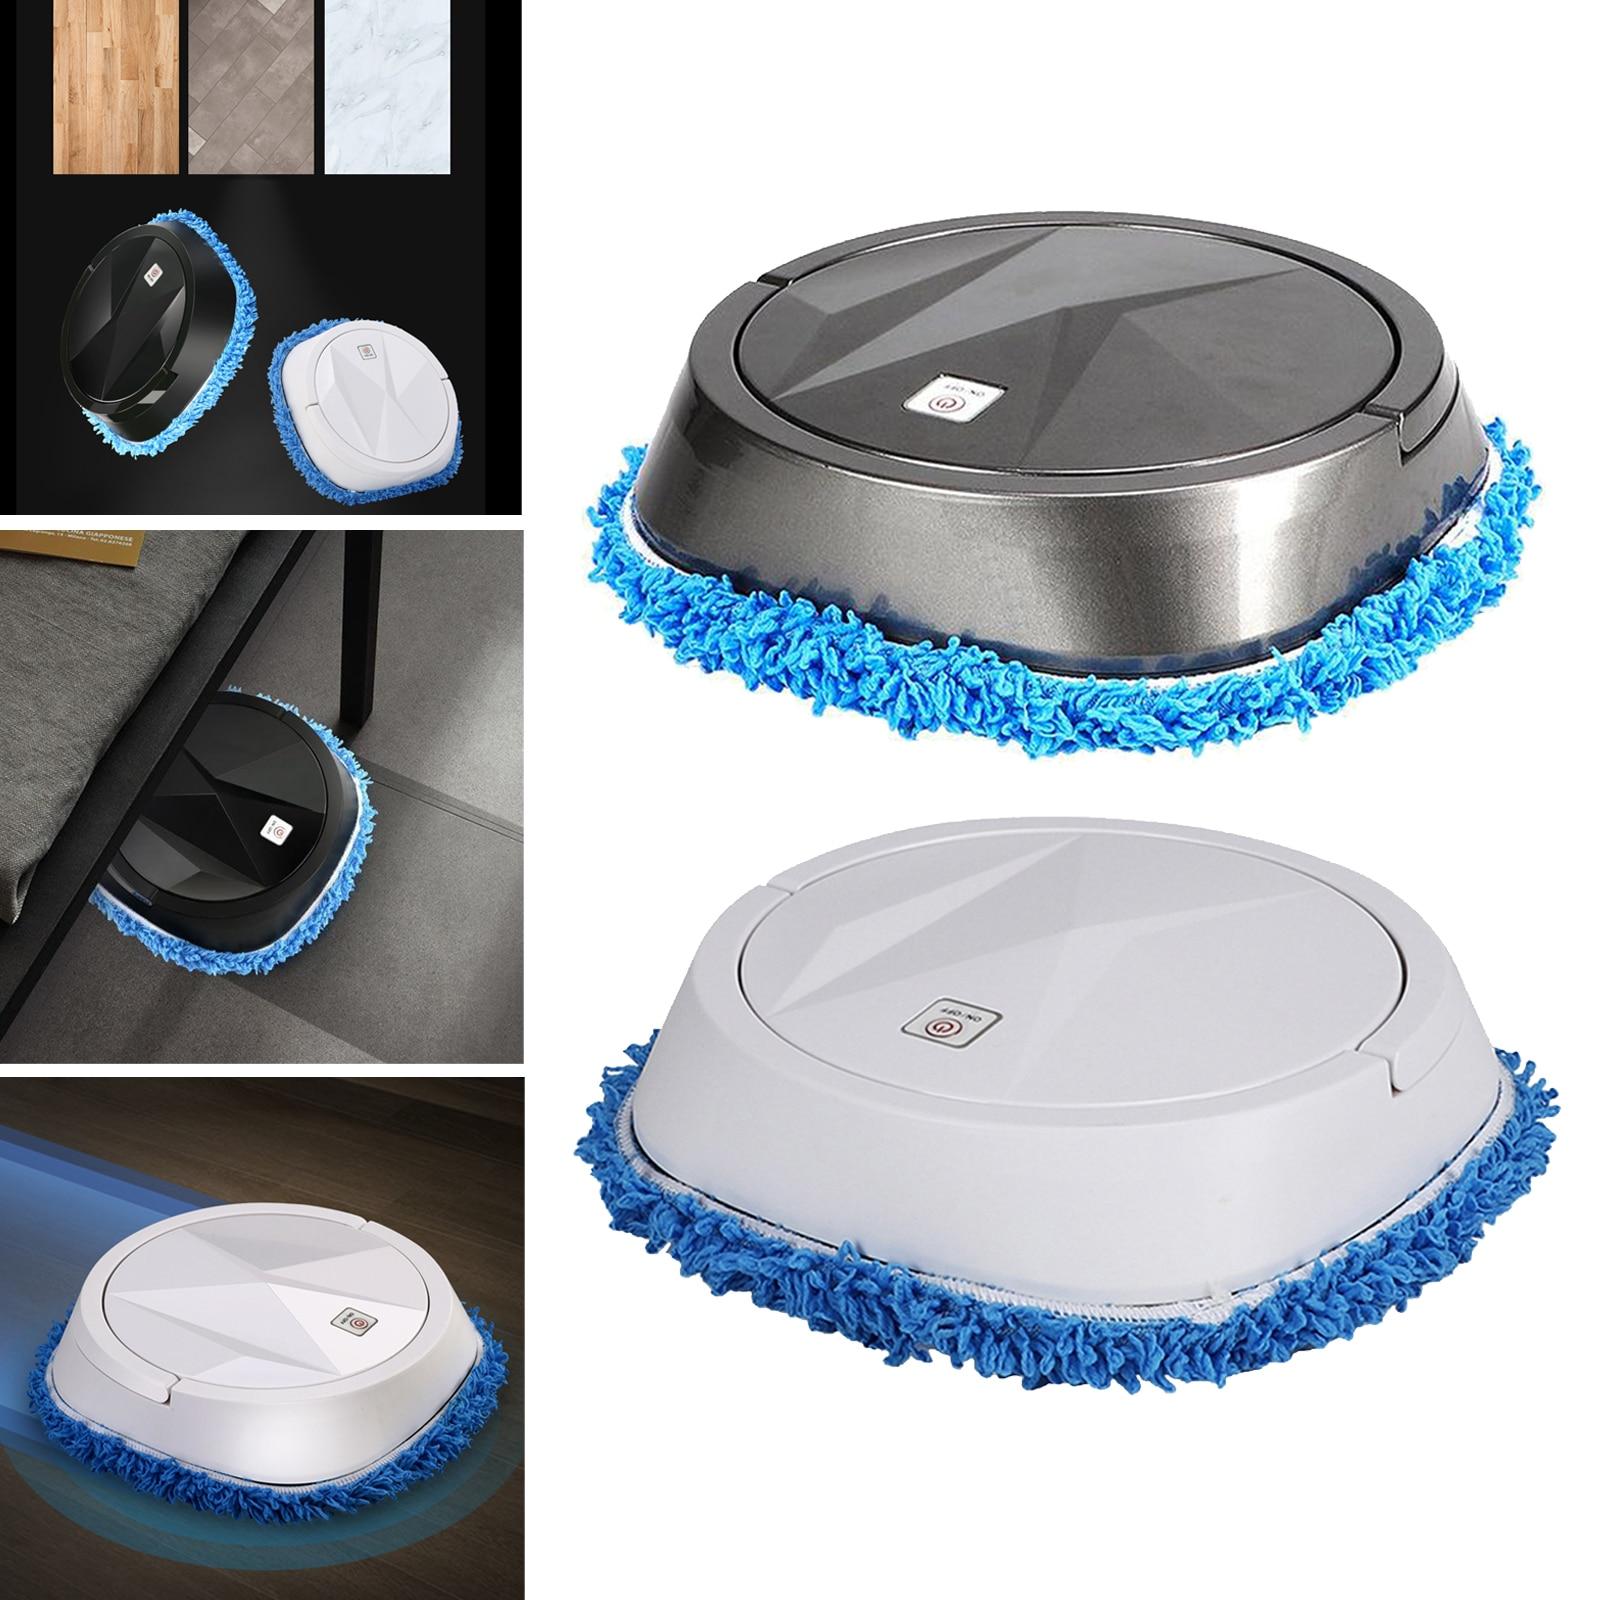 Low Noise Vacuum Cleaner Robotic Floor Sweep Mopping Machine for Tile Floors 1200mAh